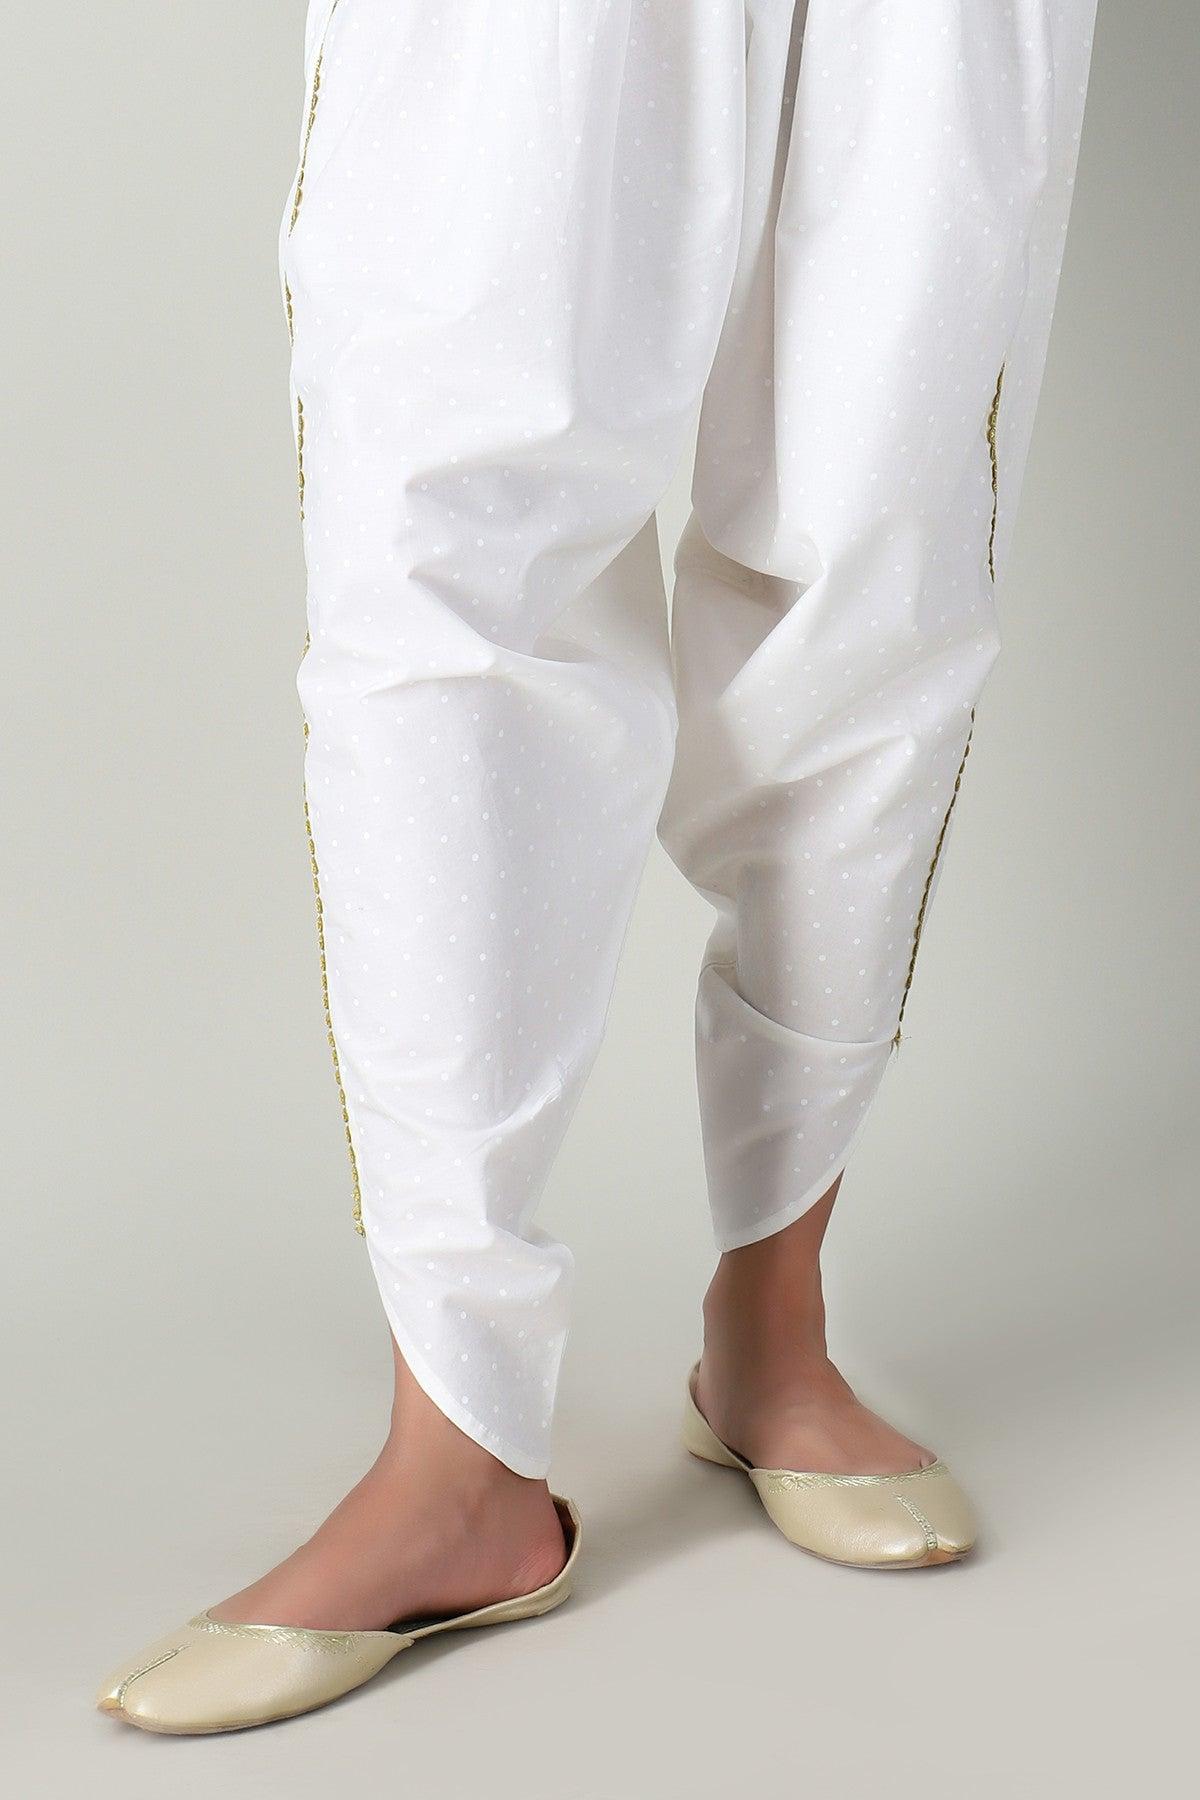 Khaadi WSHP20331 WHITE Pret